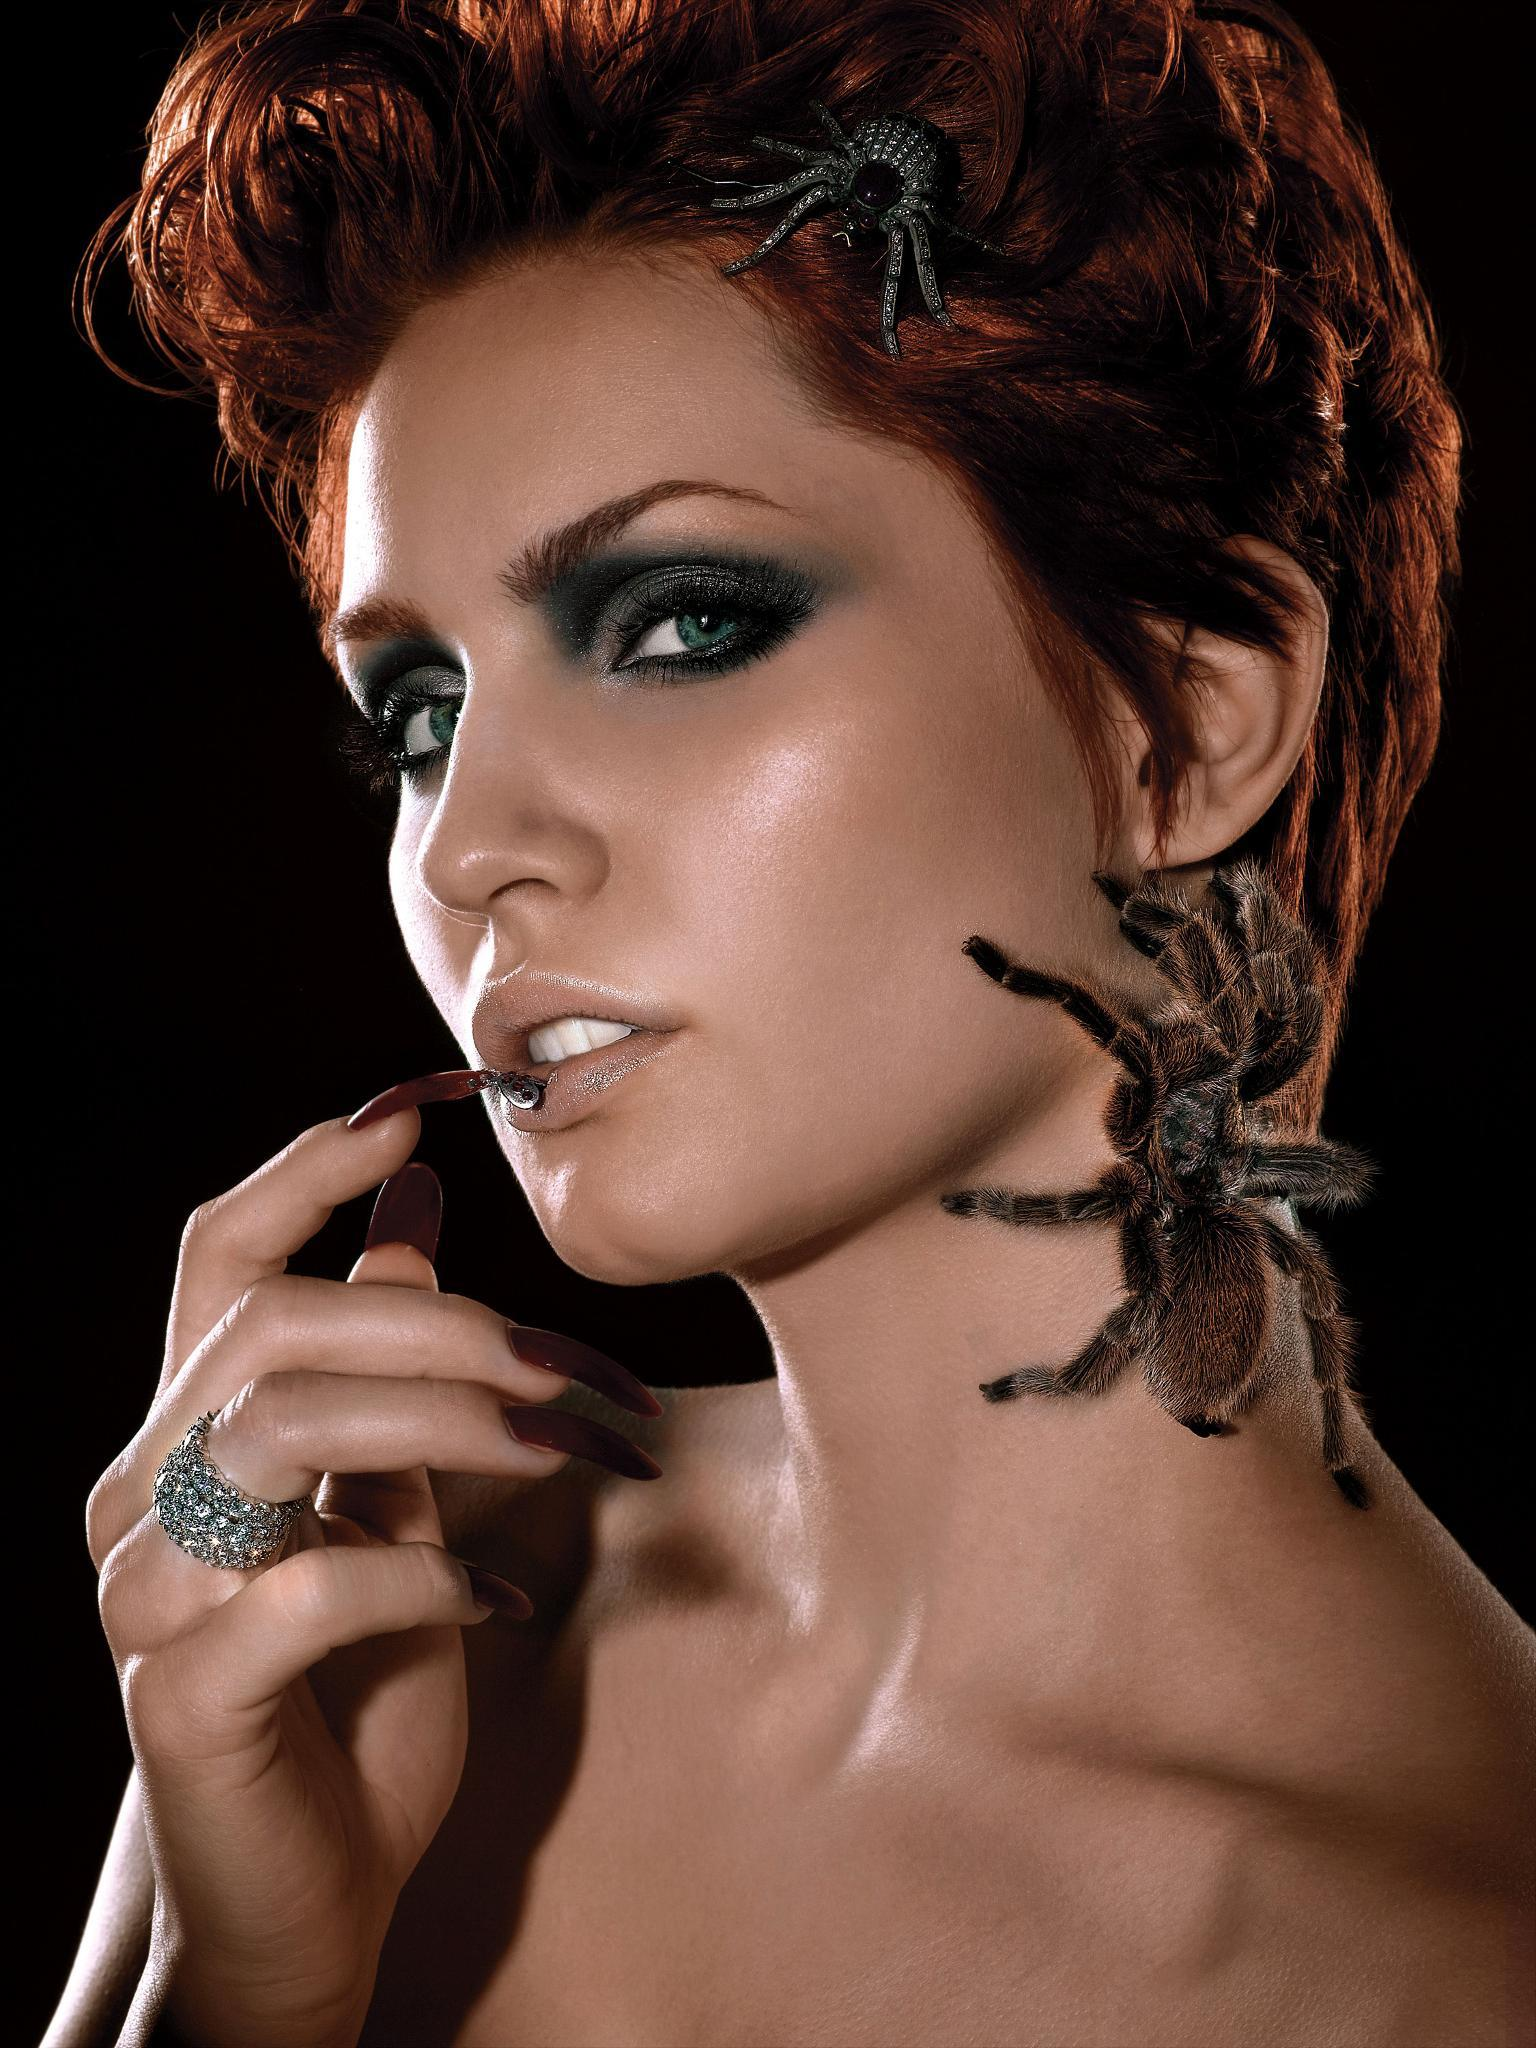 ANTM-Nicole08-Bill-Diodato.jpg